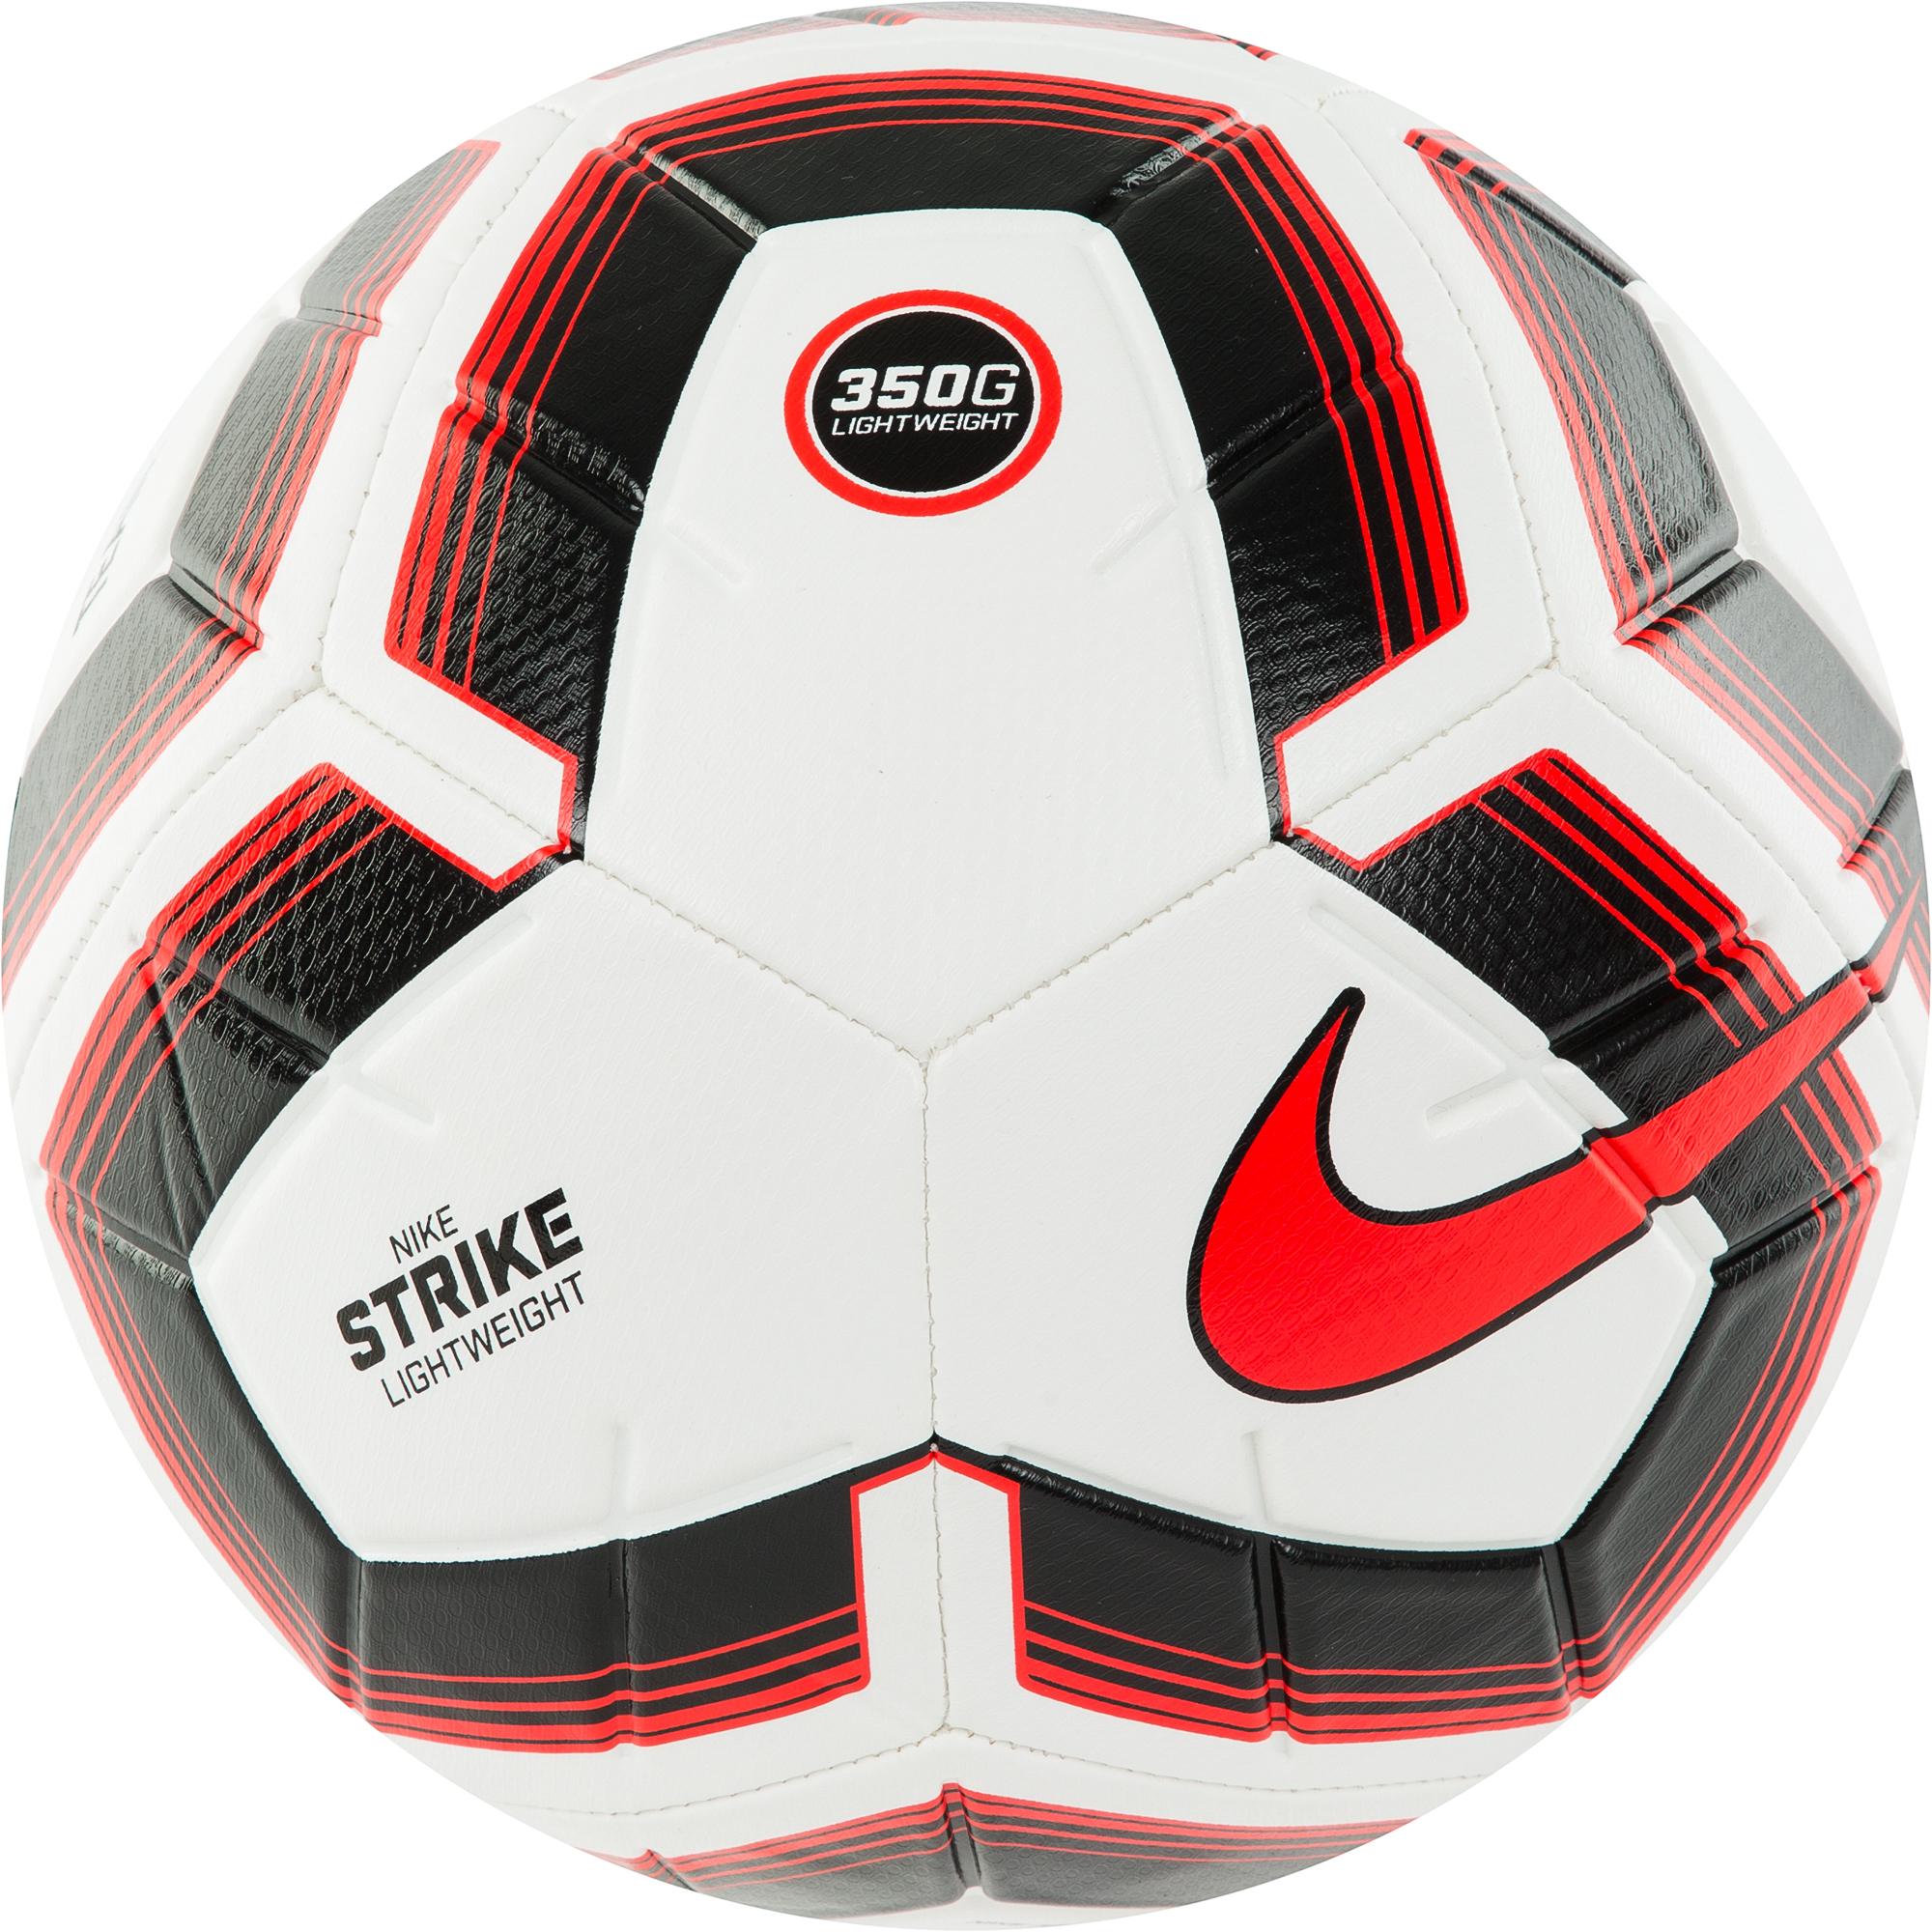 Nike NK STRK TEAM 350G nike мяч nk merc fade